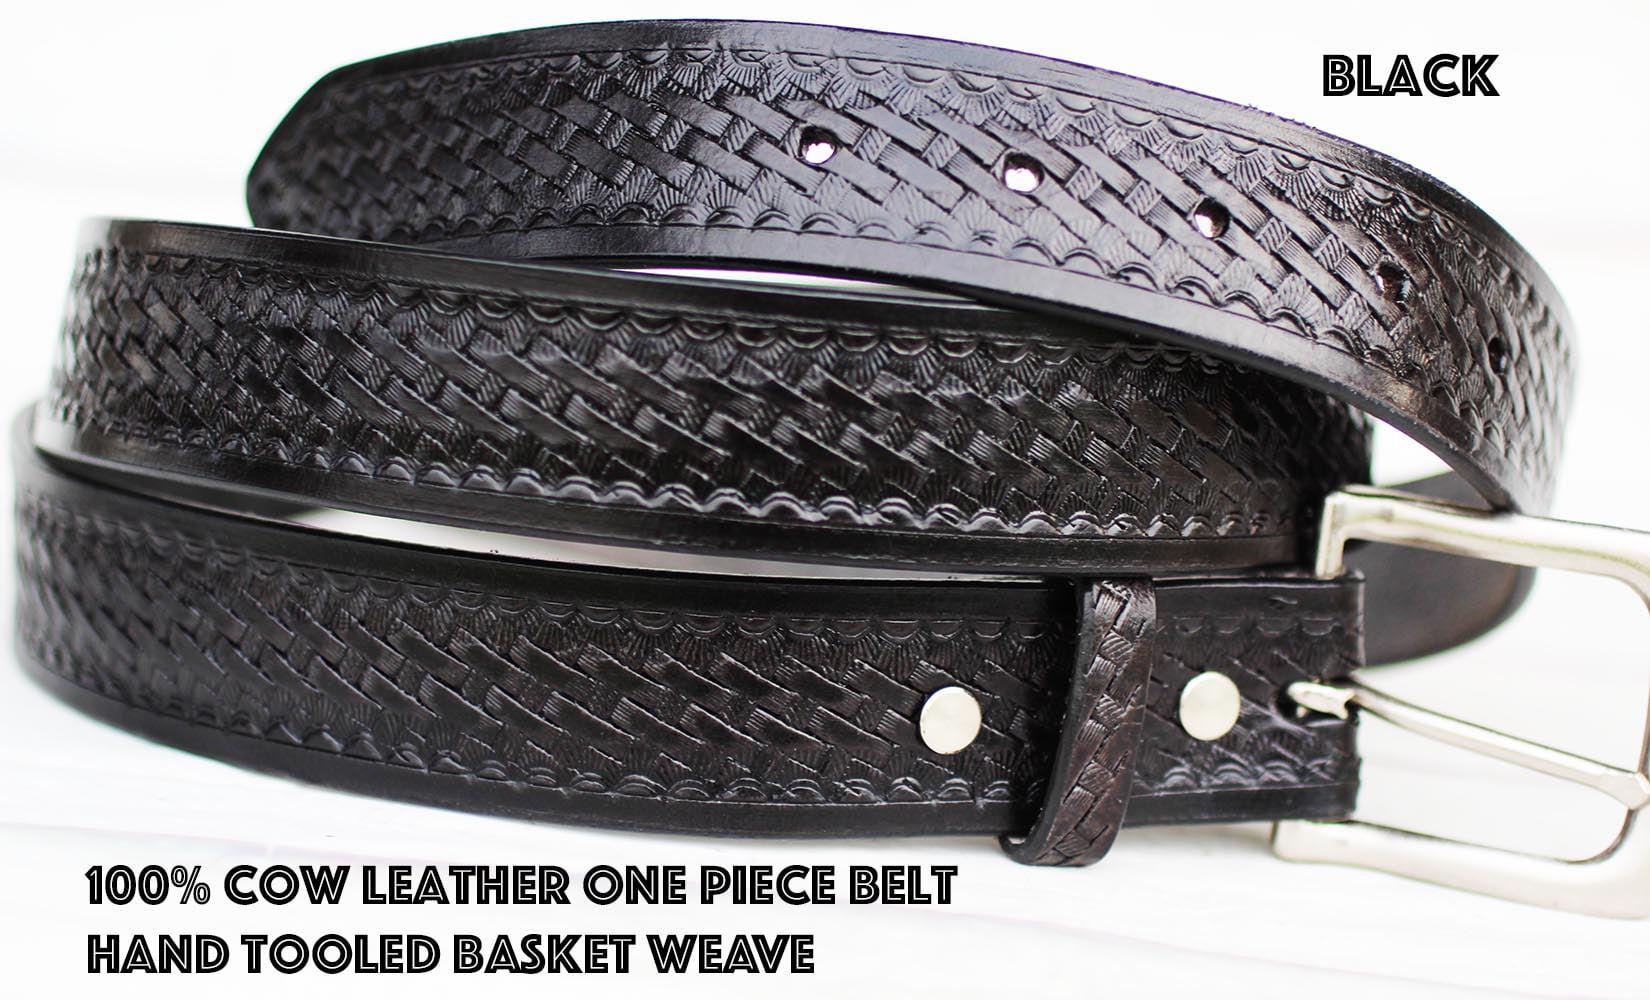 Cowhide 100% Leather Basketweave Uniform Mens Belt Black 2609RS02BK